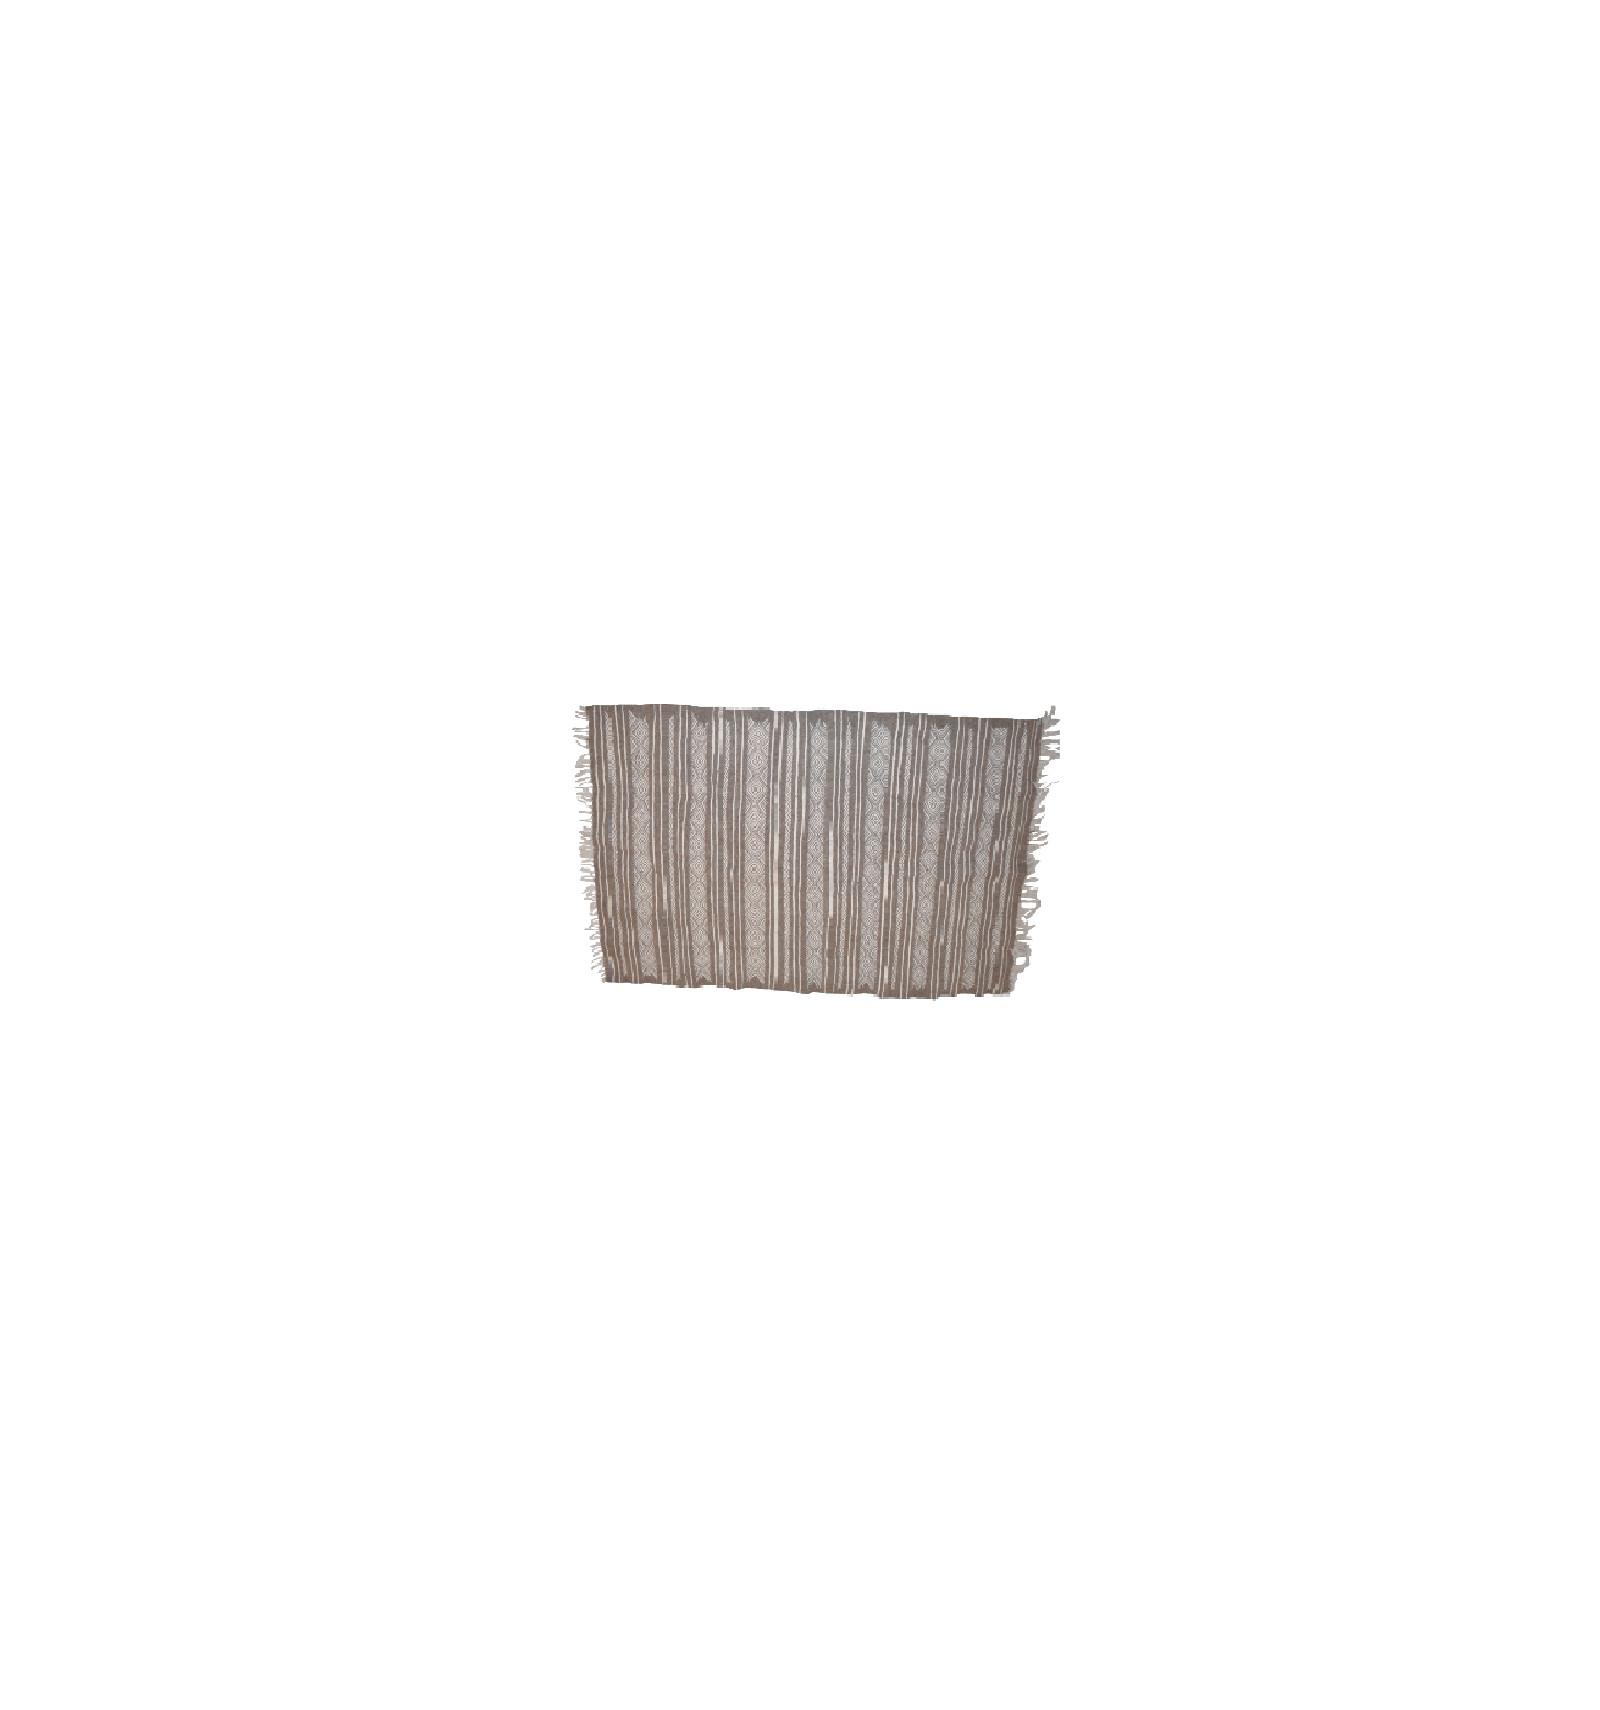 Carrelage design tapis blanc et gris moderne design for Tapis gris clair et blanc